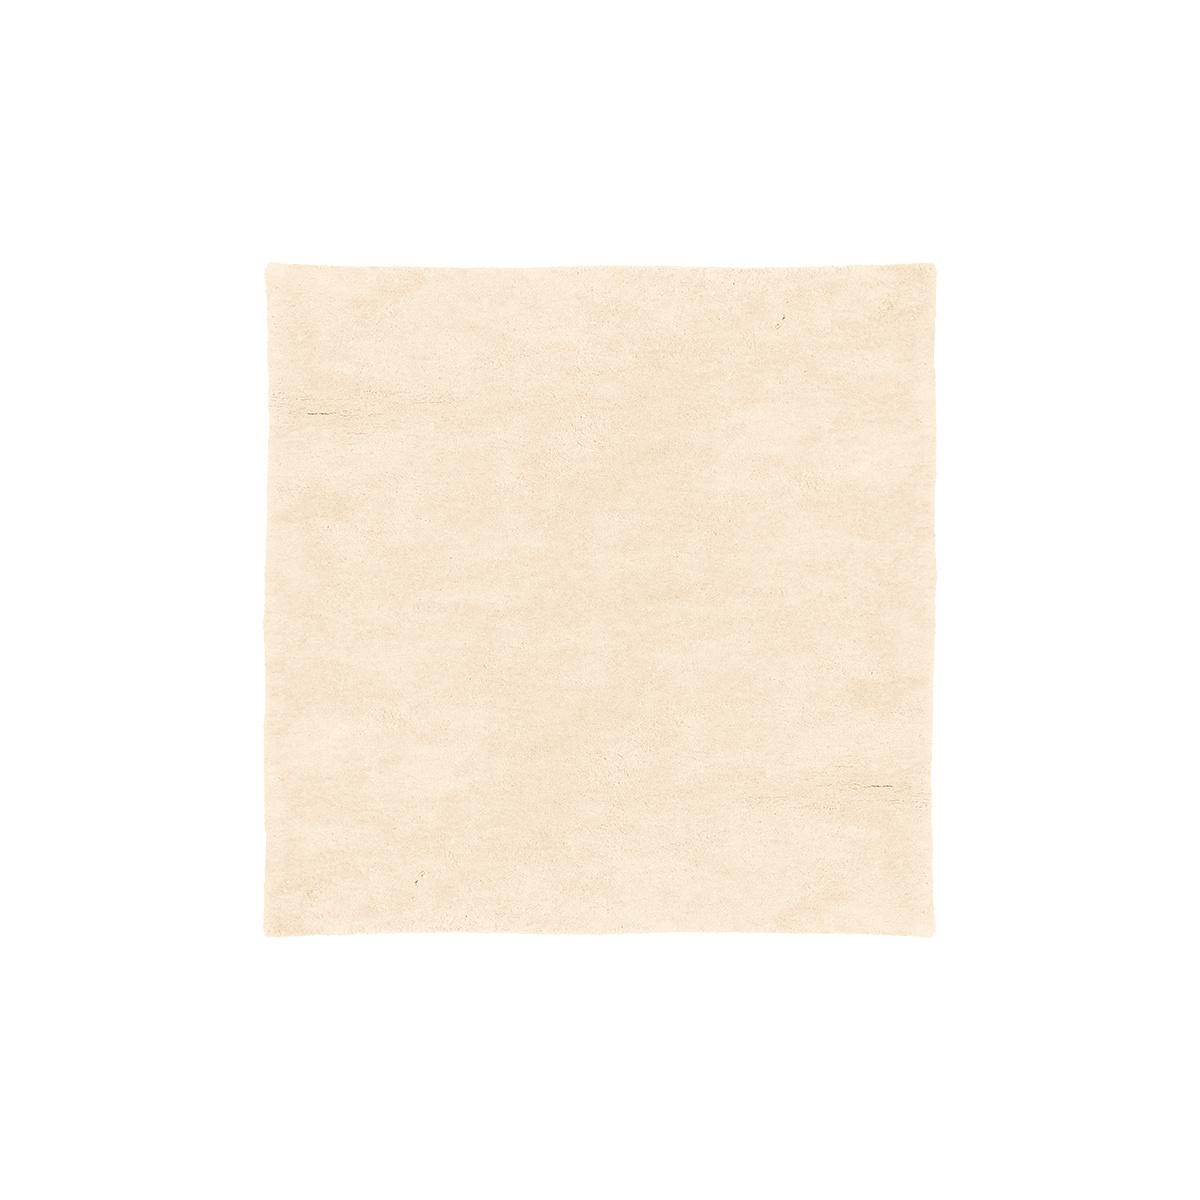 Velluto Rug, Off-White 200 x 200